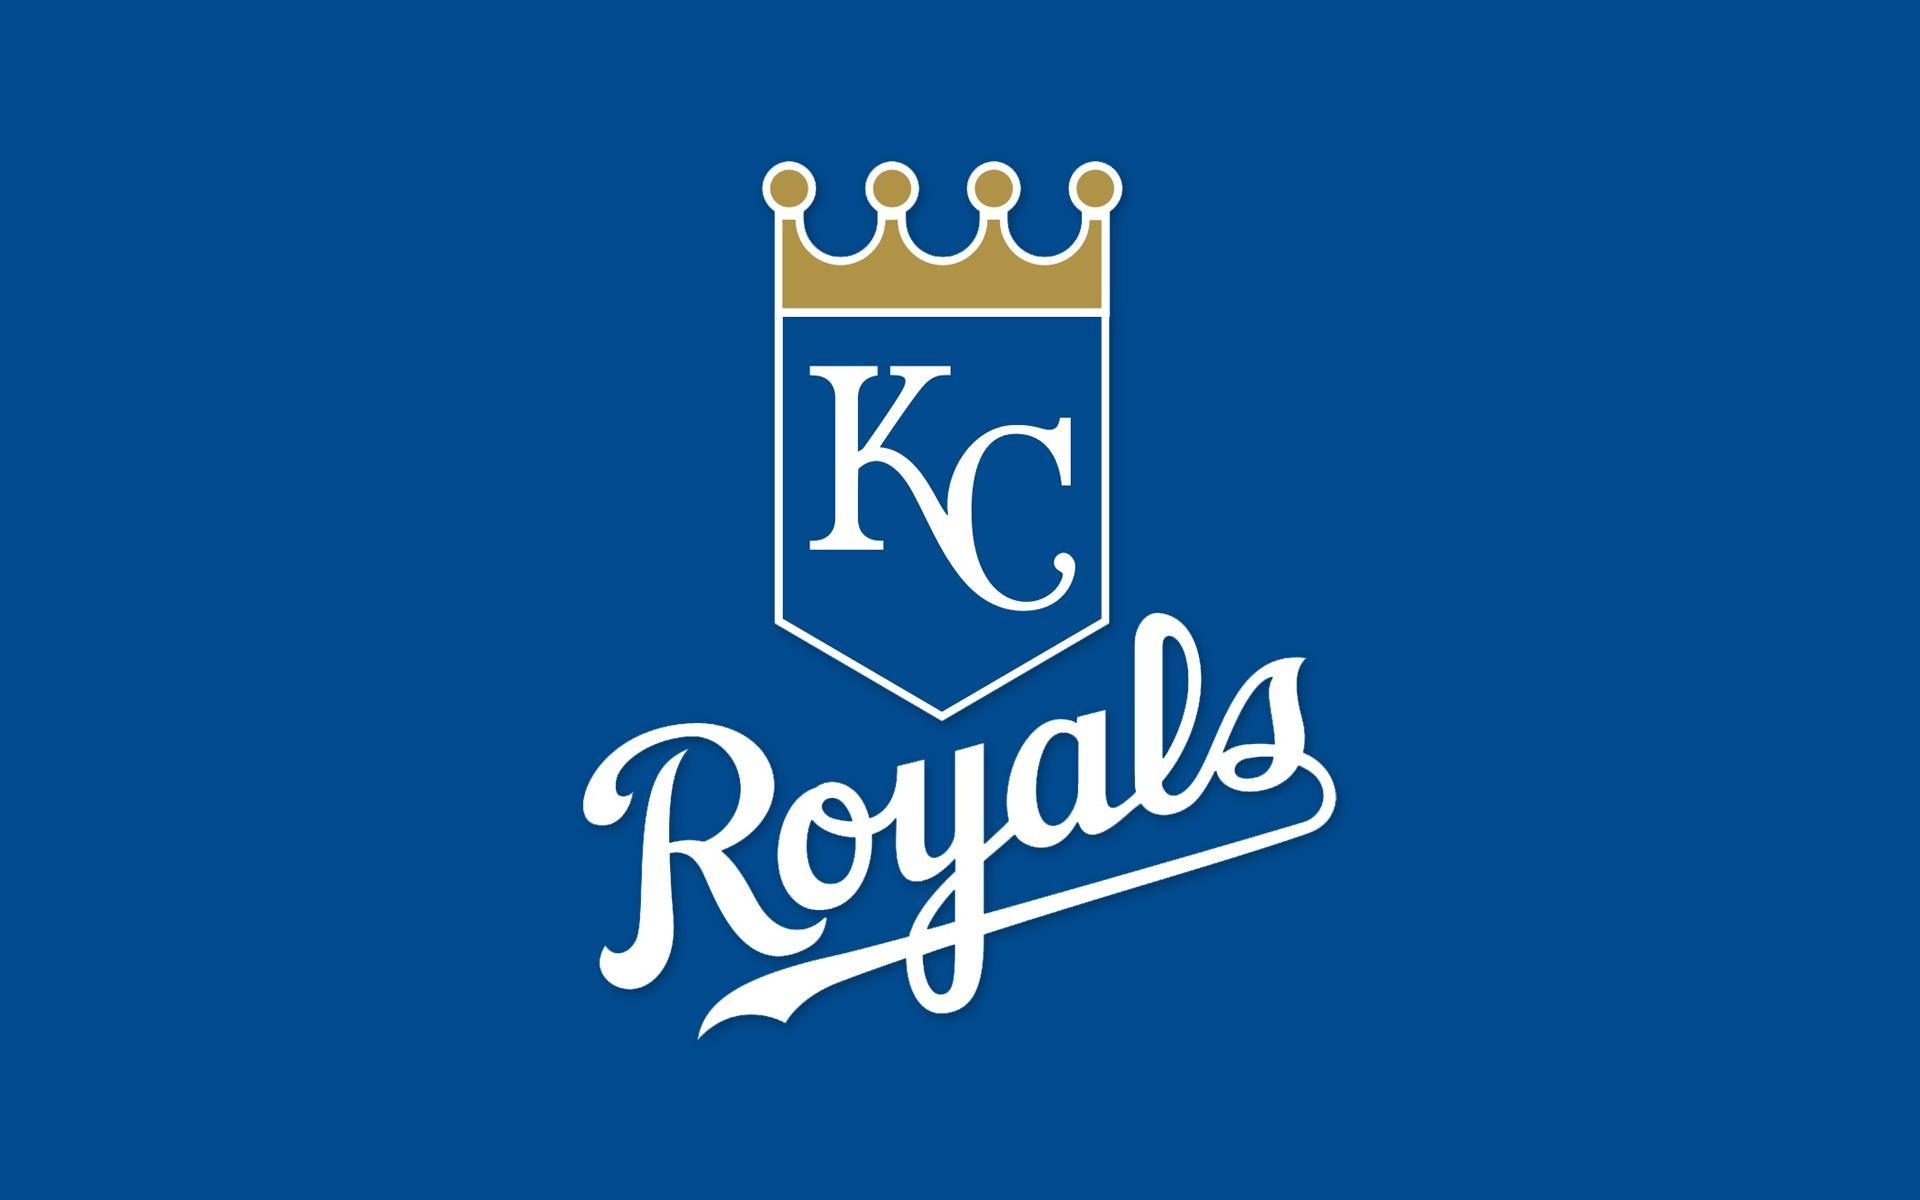 Kansas City Royals Wallpapers Browser Themes More 1920x1200